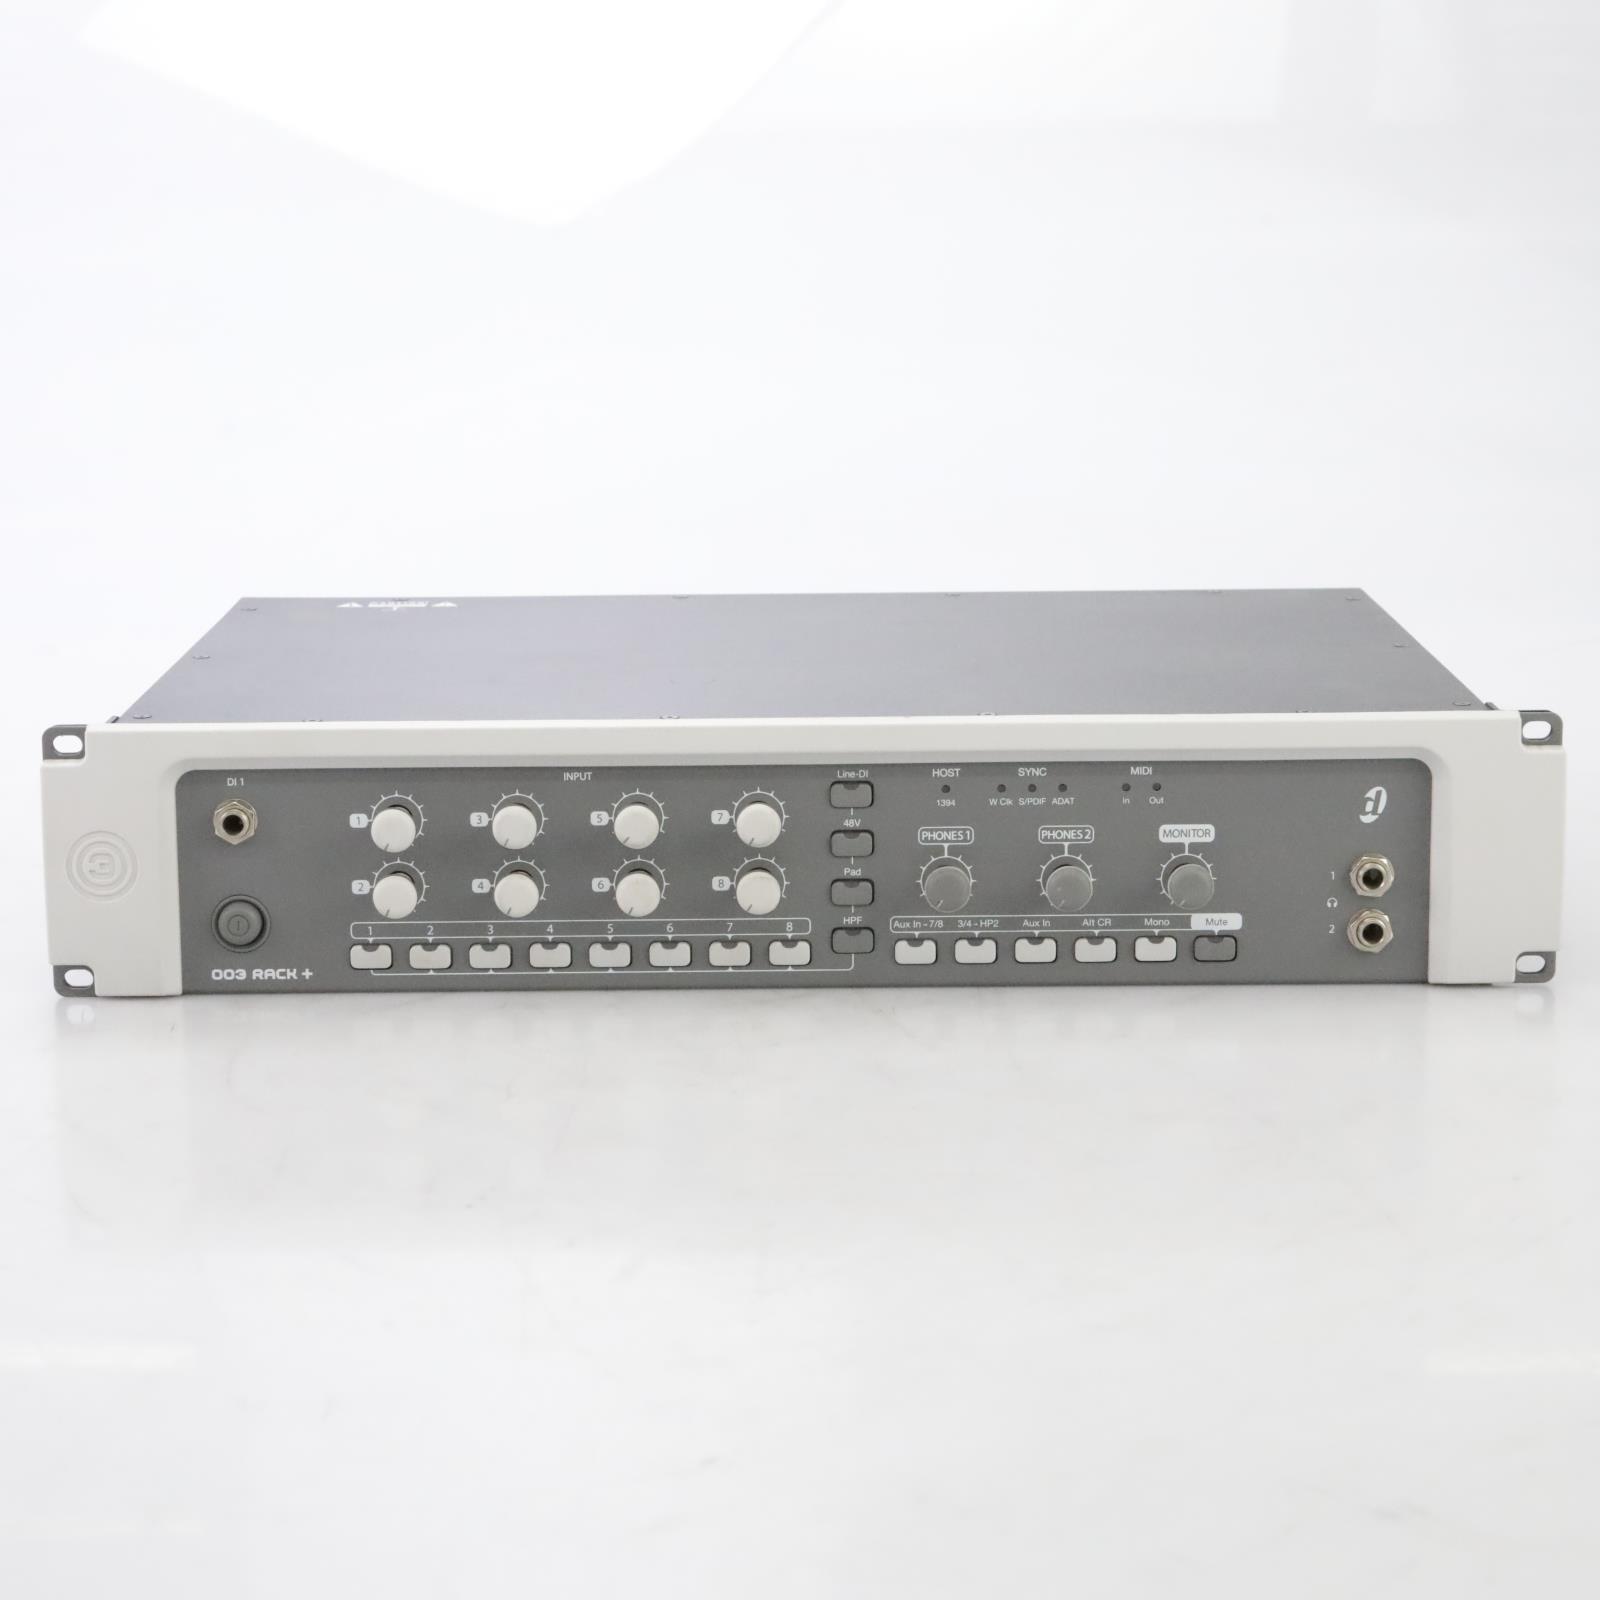 Digidesign 003 Rack+ 8 Mic Preamps Firewire Interface Rack #44489